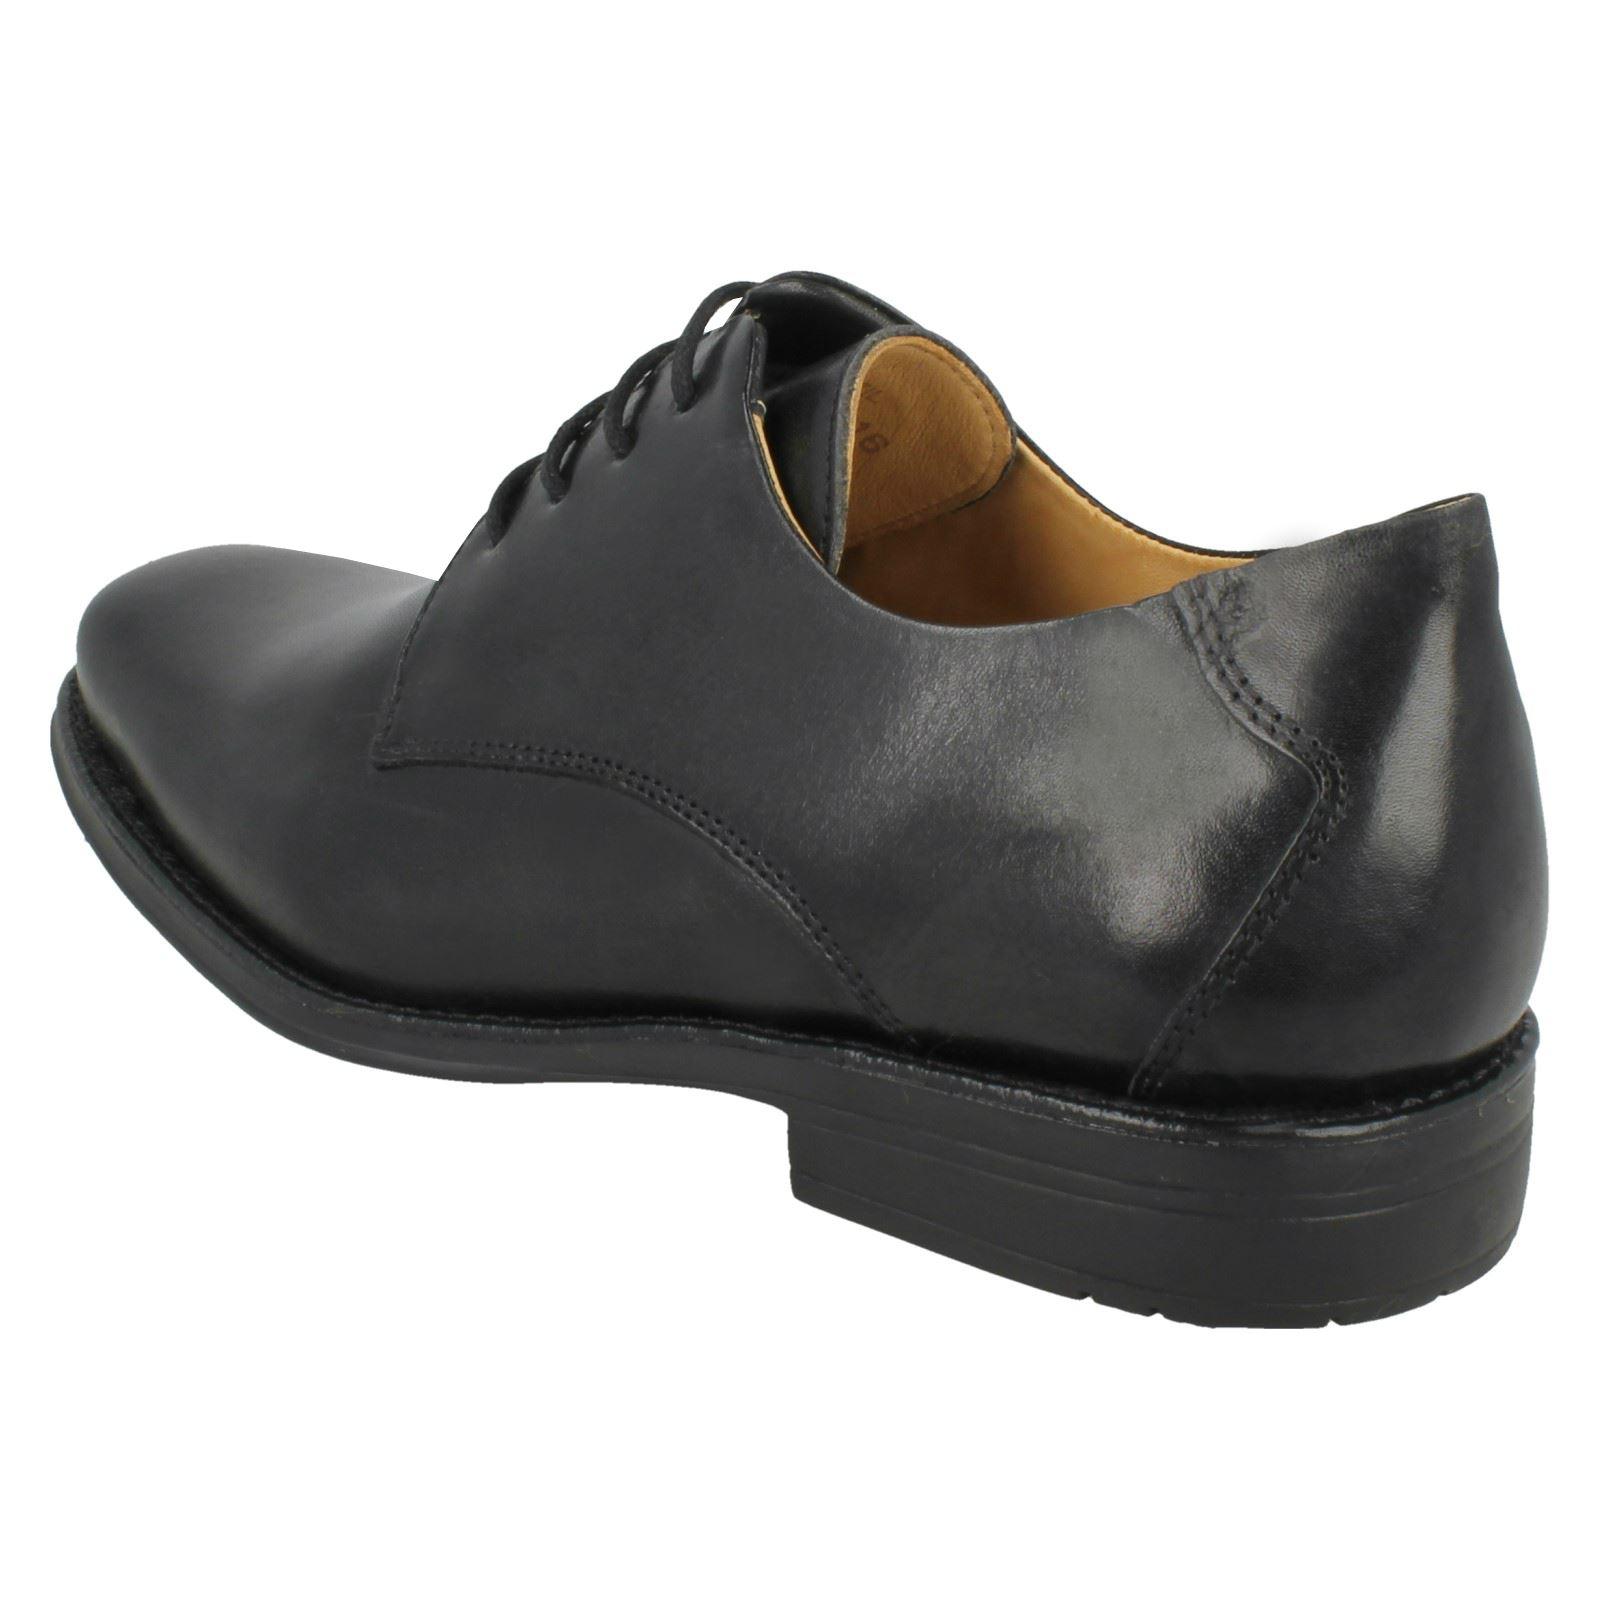 'Leme' Herren Anatomic Formal Schuhes 'Leme'  2d3ec6